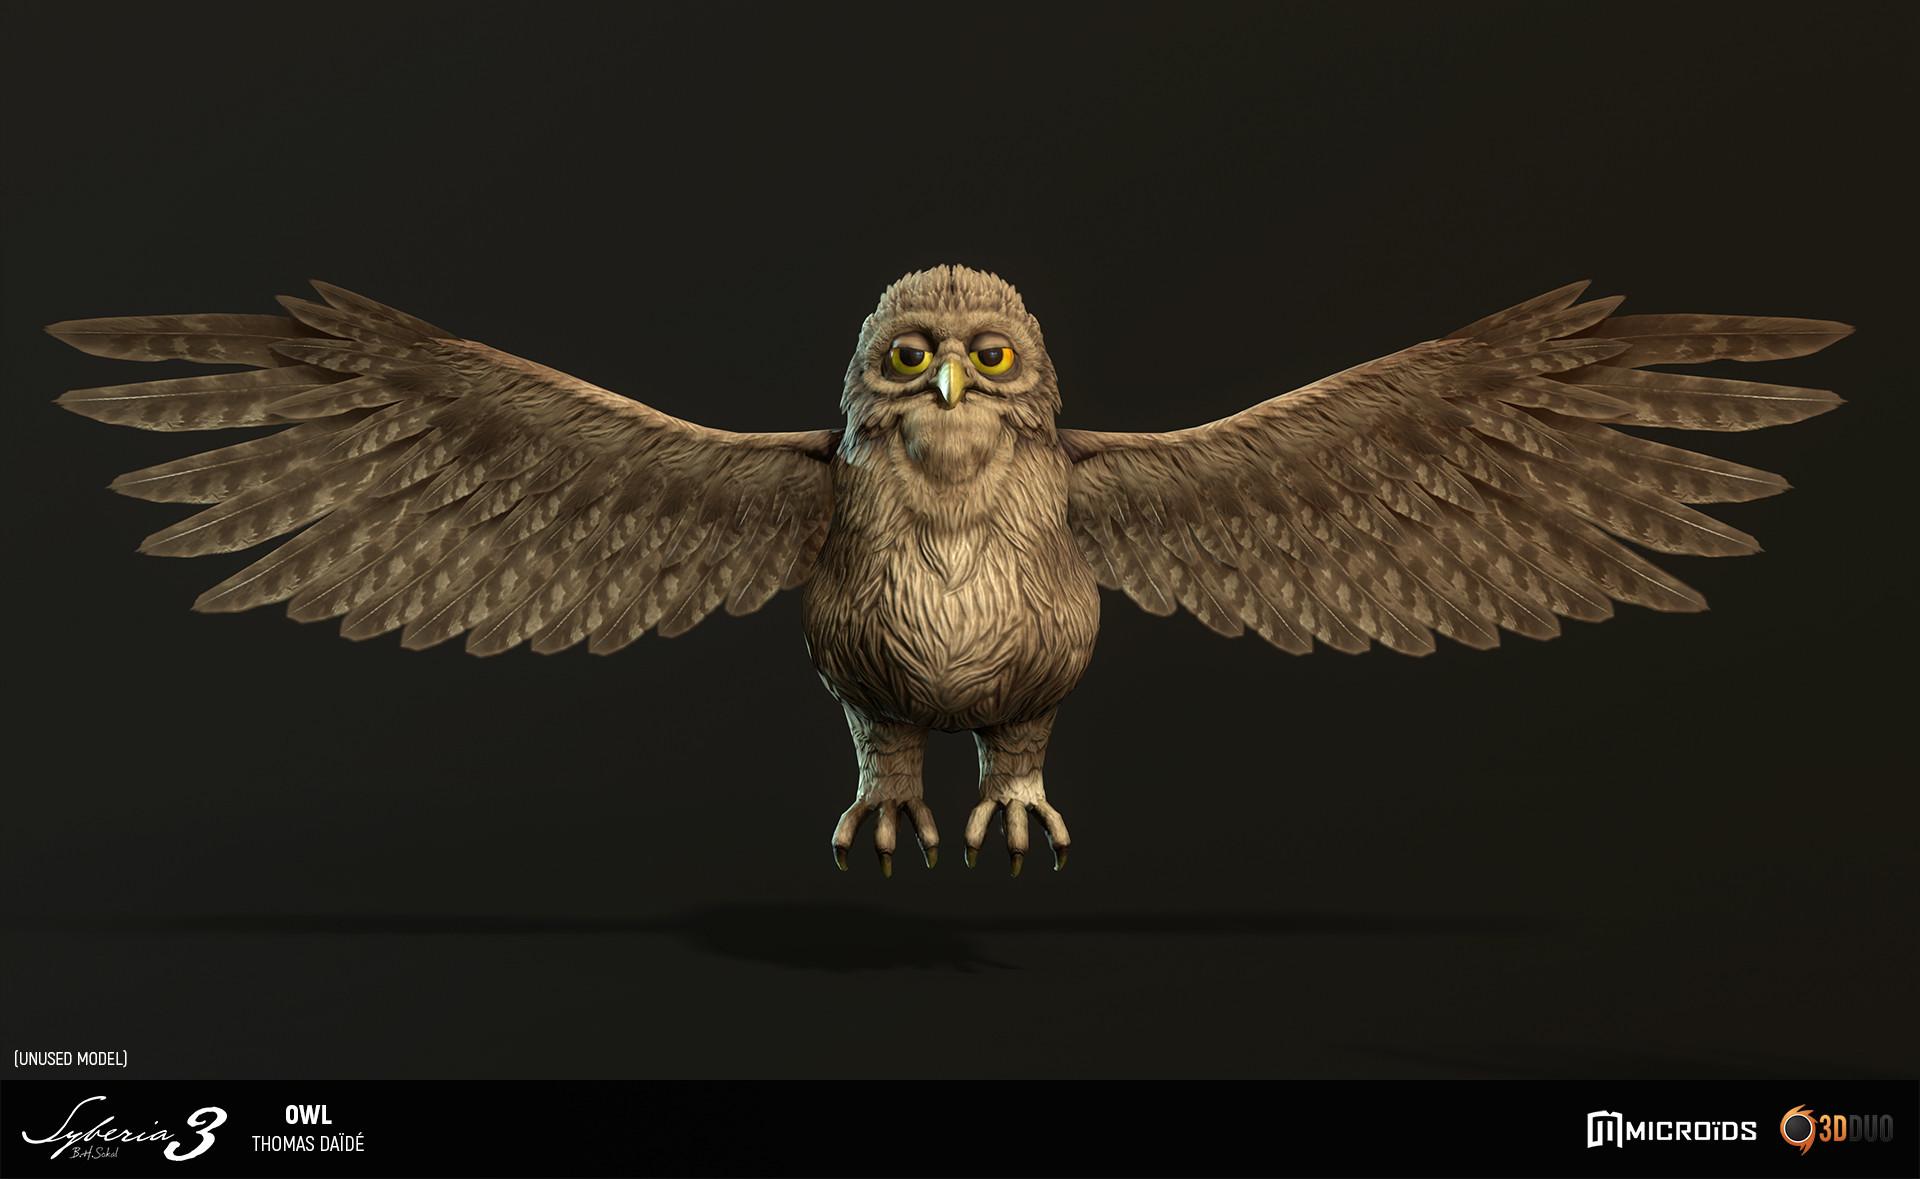 Thomas daide tdaide syb owl 05